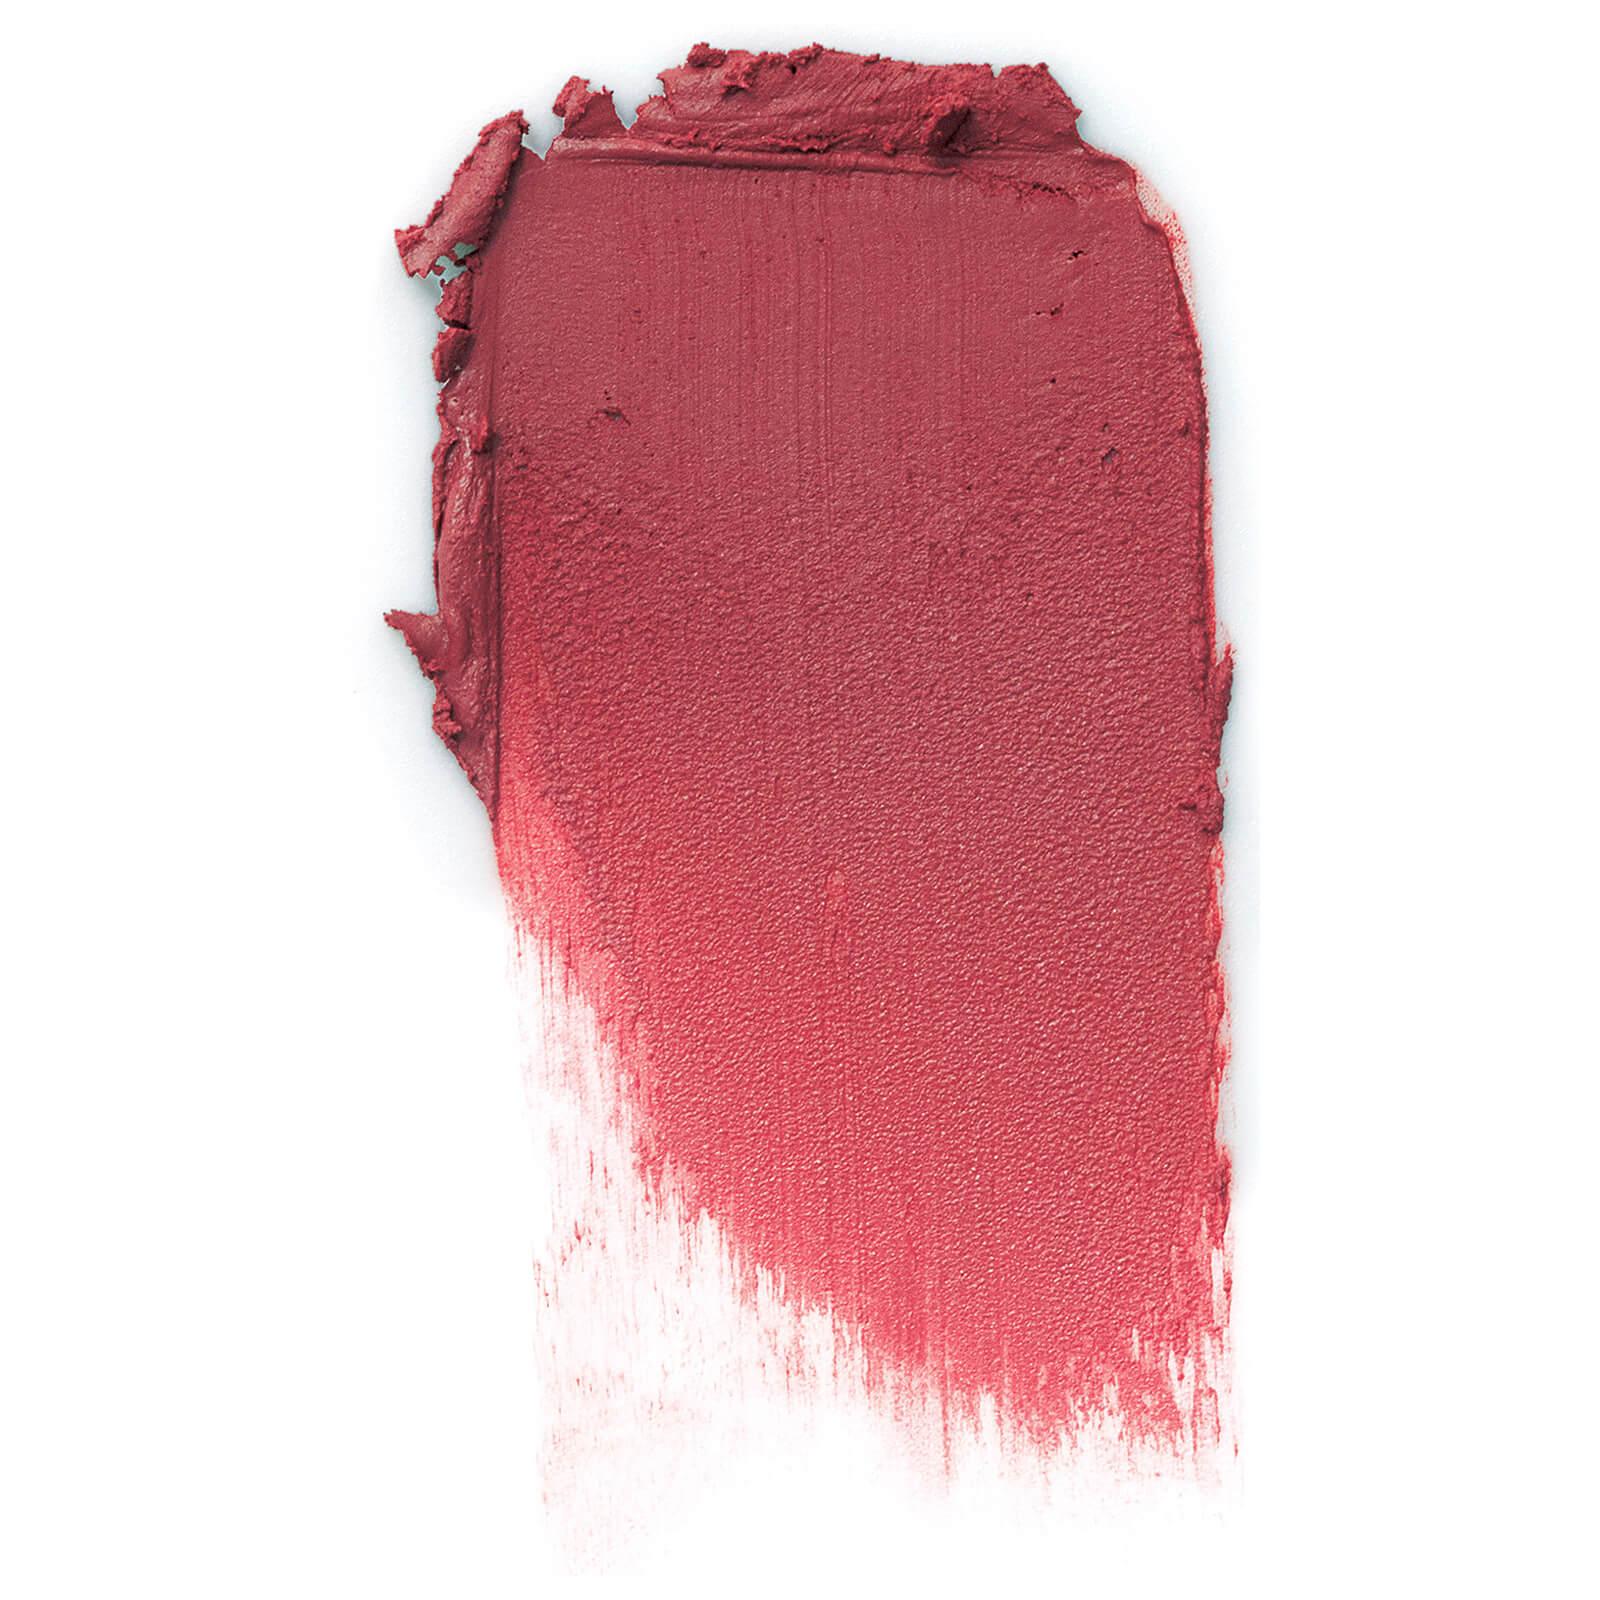 Bobbi Brown Luxe Matte Lip Colour (Various Shades) - Burnt Cherry